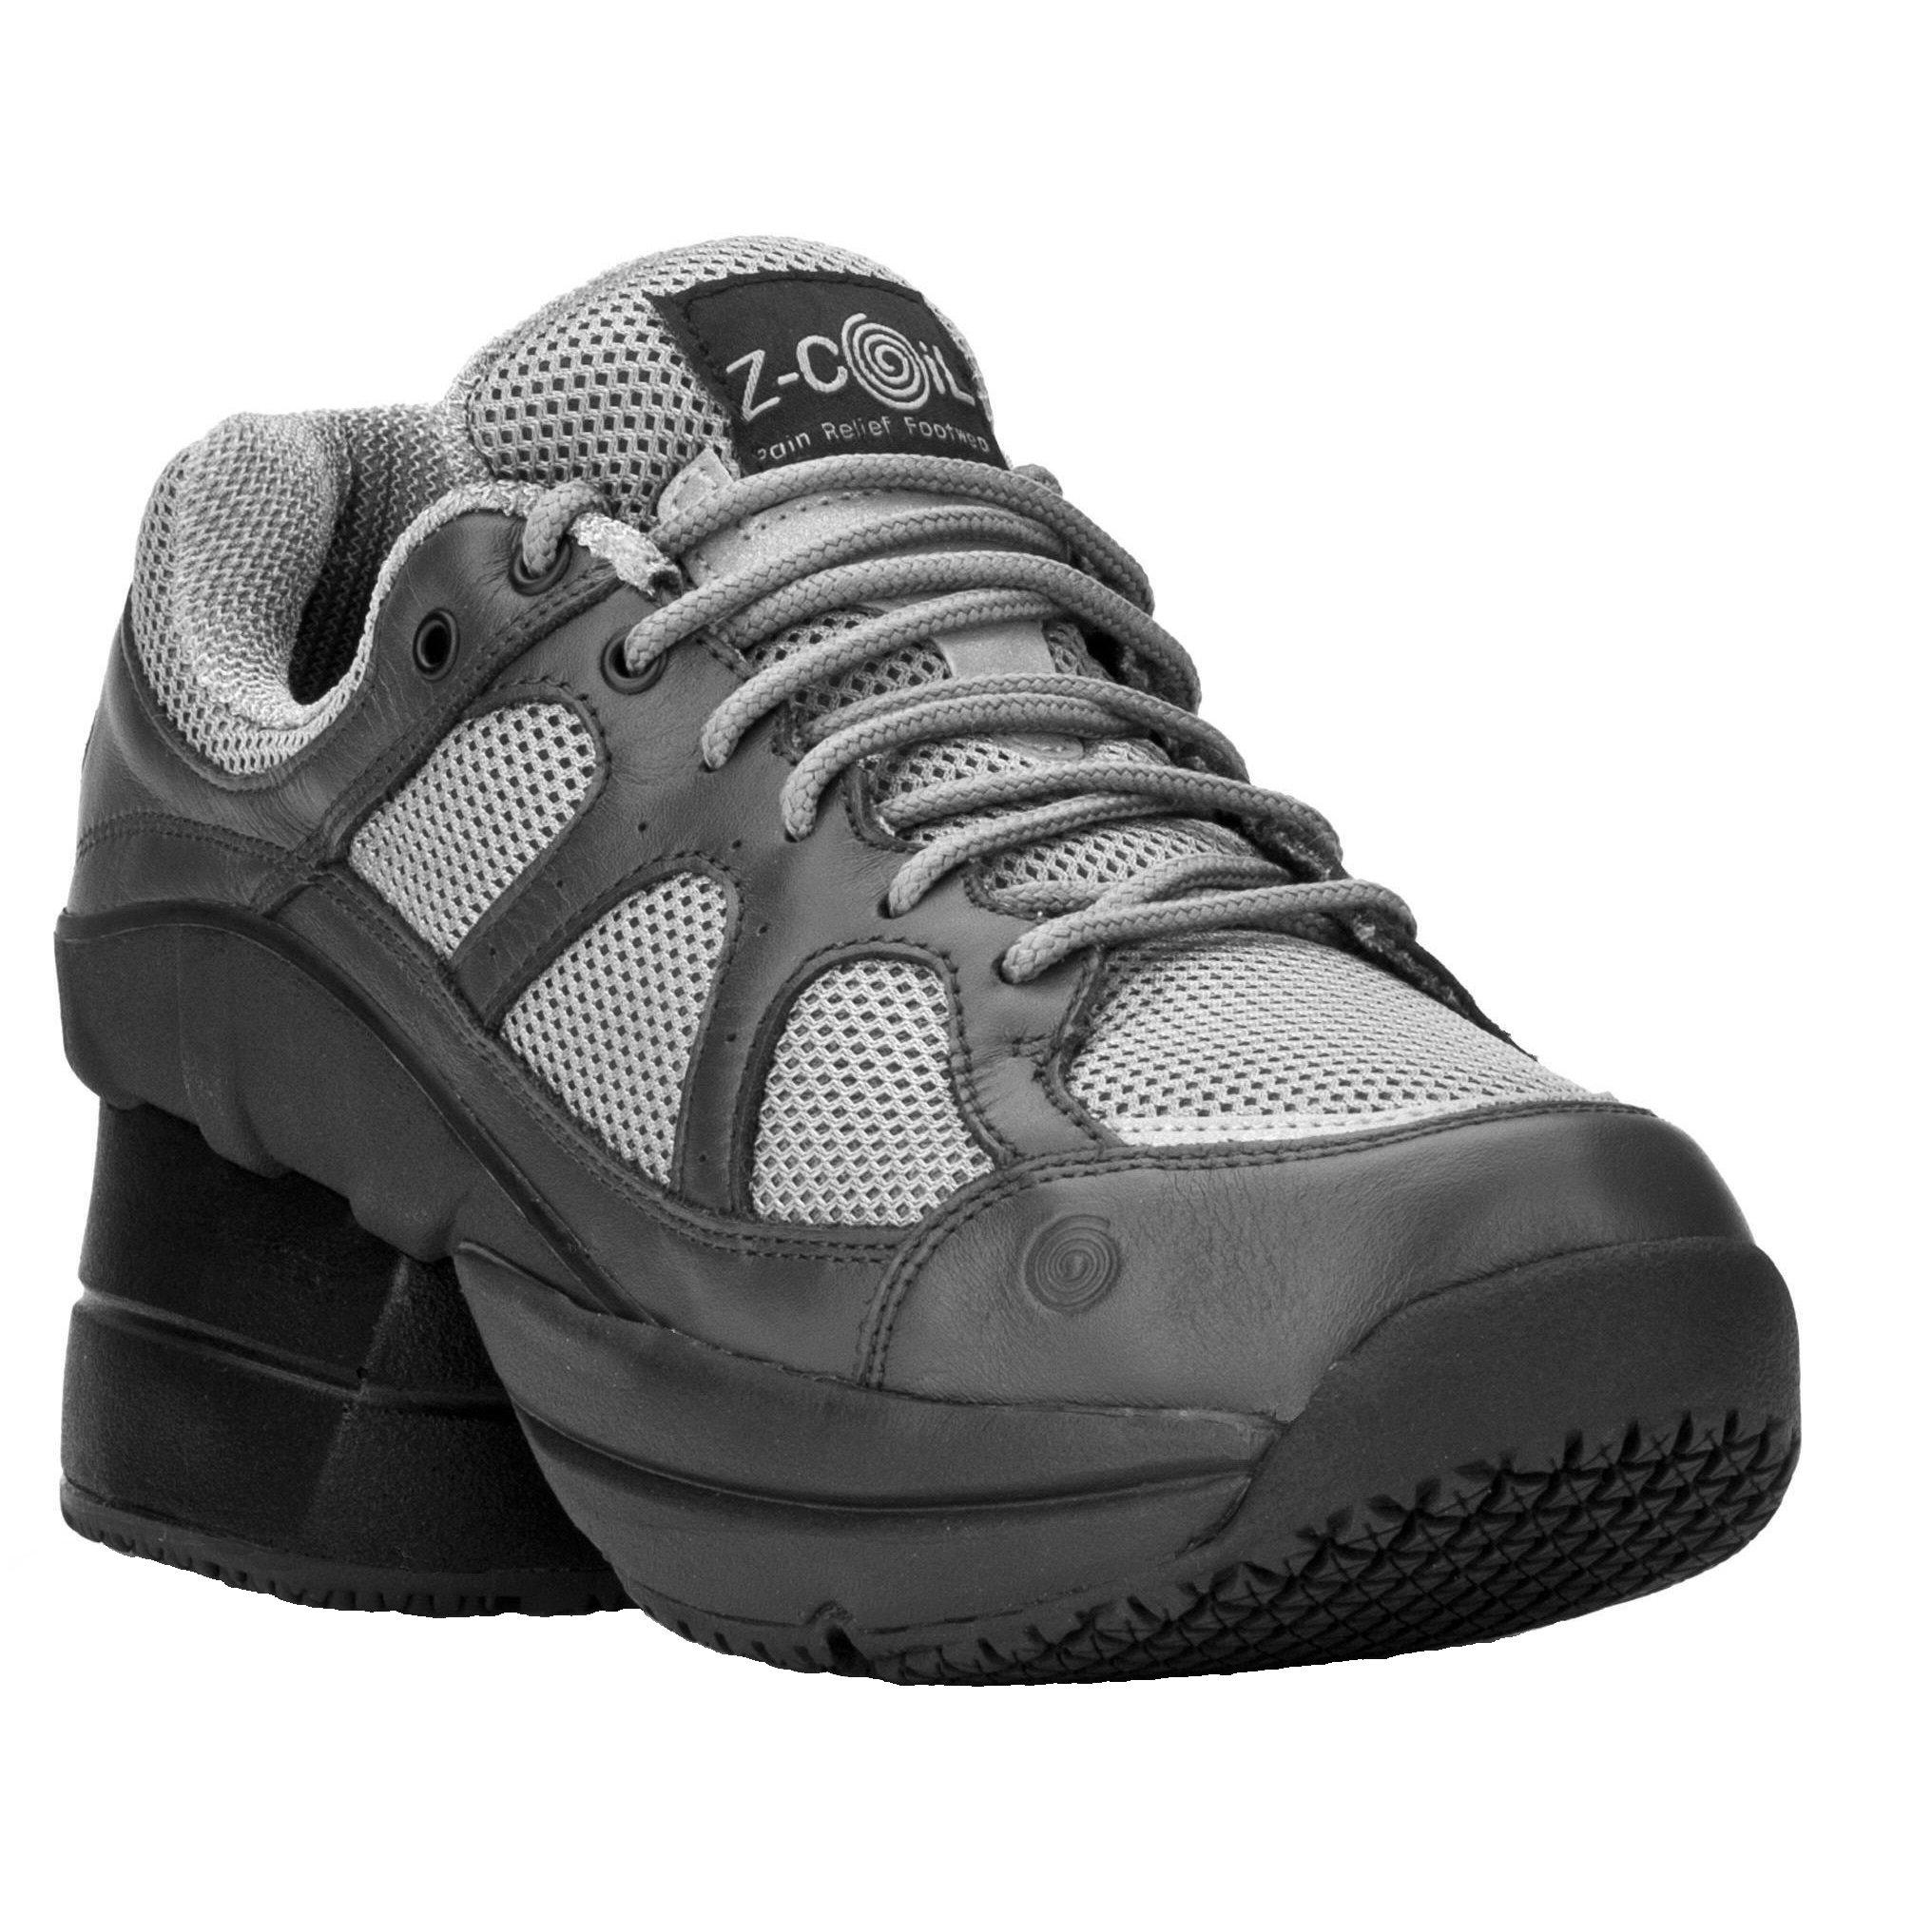 Z-CoiL Women's Liberty Slip Resistant Enclosed CoiL Gray Leather Tennis Shoe 9 E US